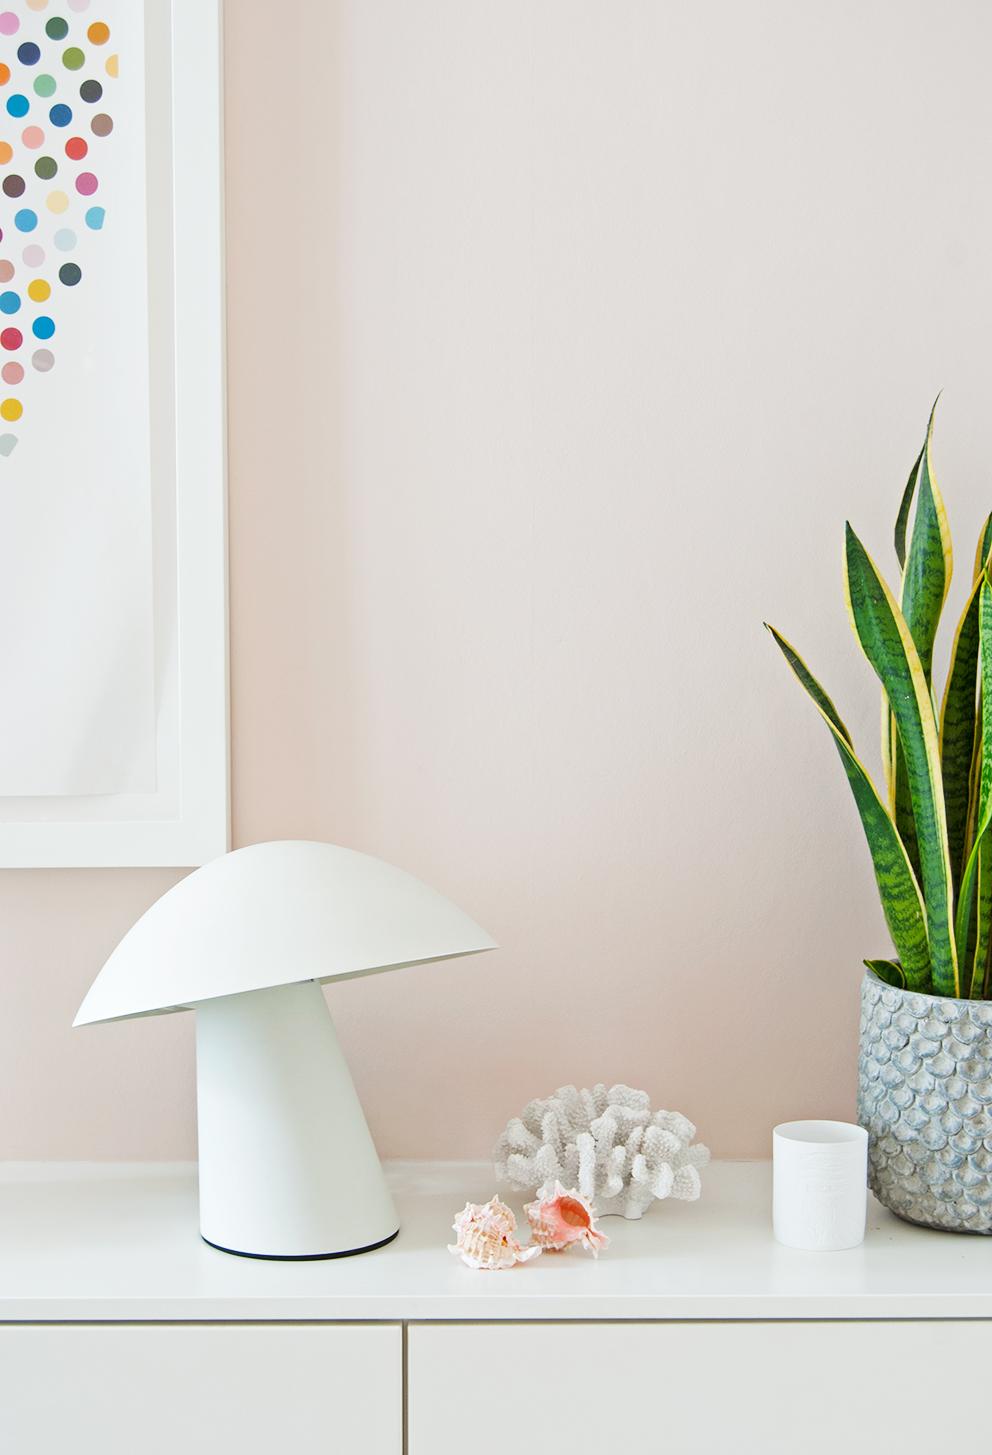 French For Pineapple Blog - Porcini Lamp